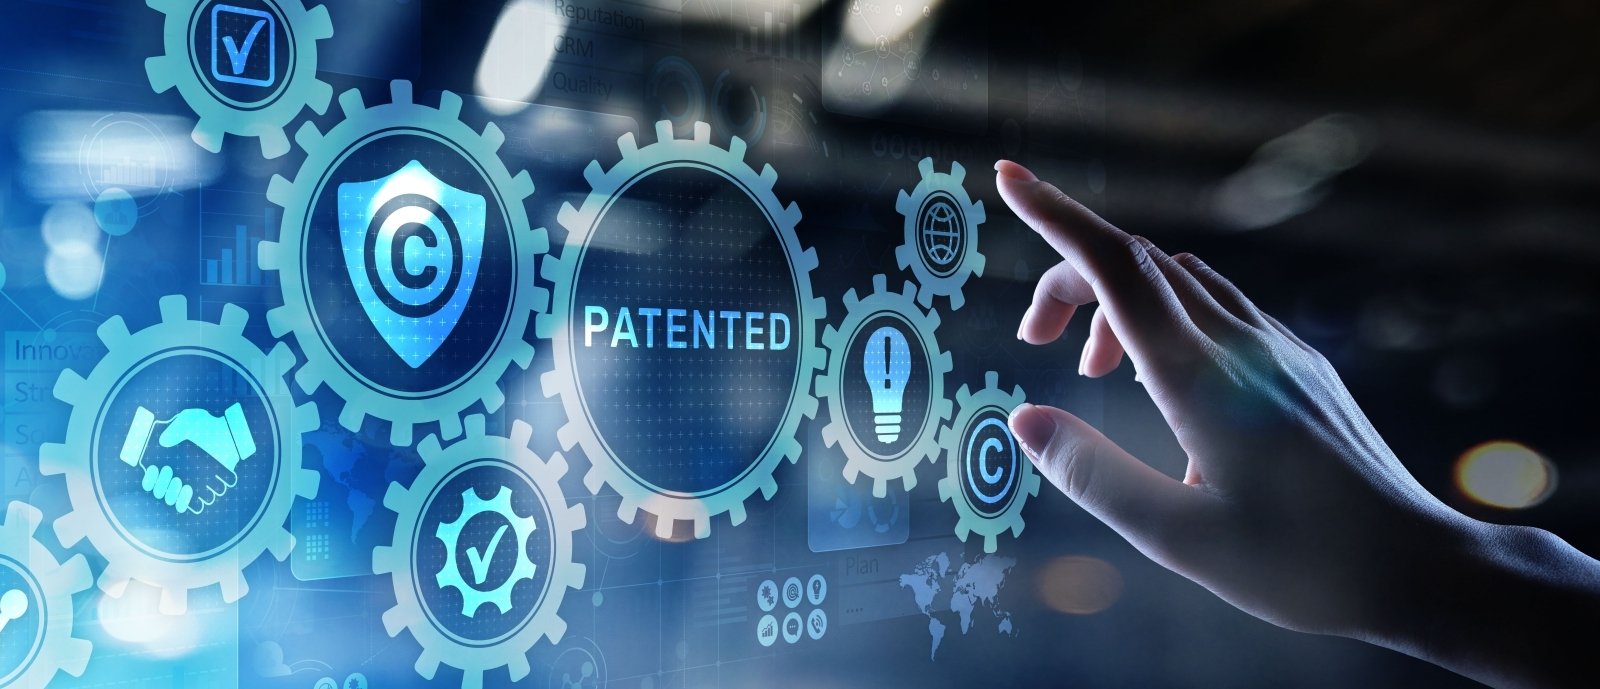 Patent.jpg#asset:2816